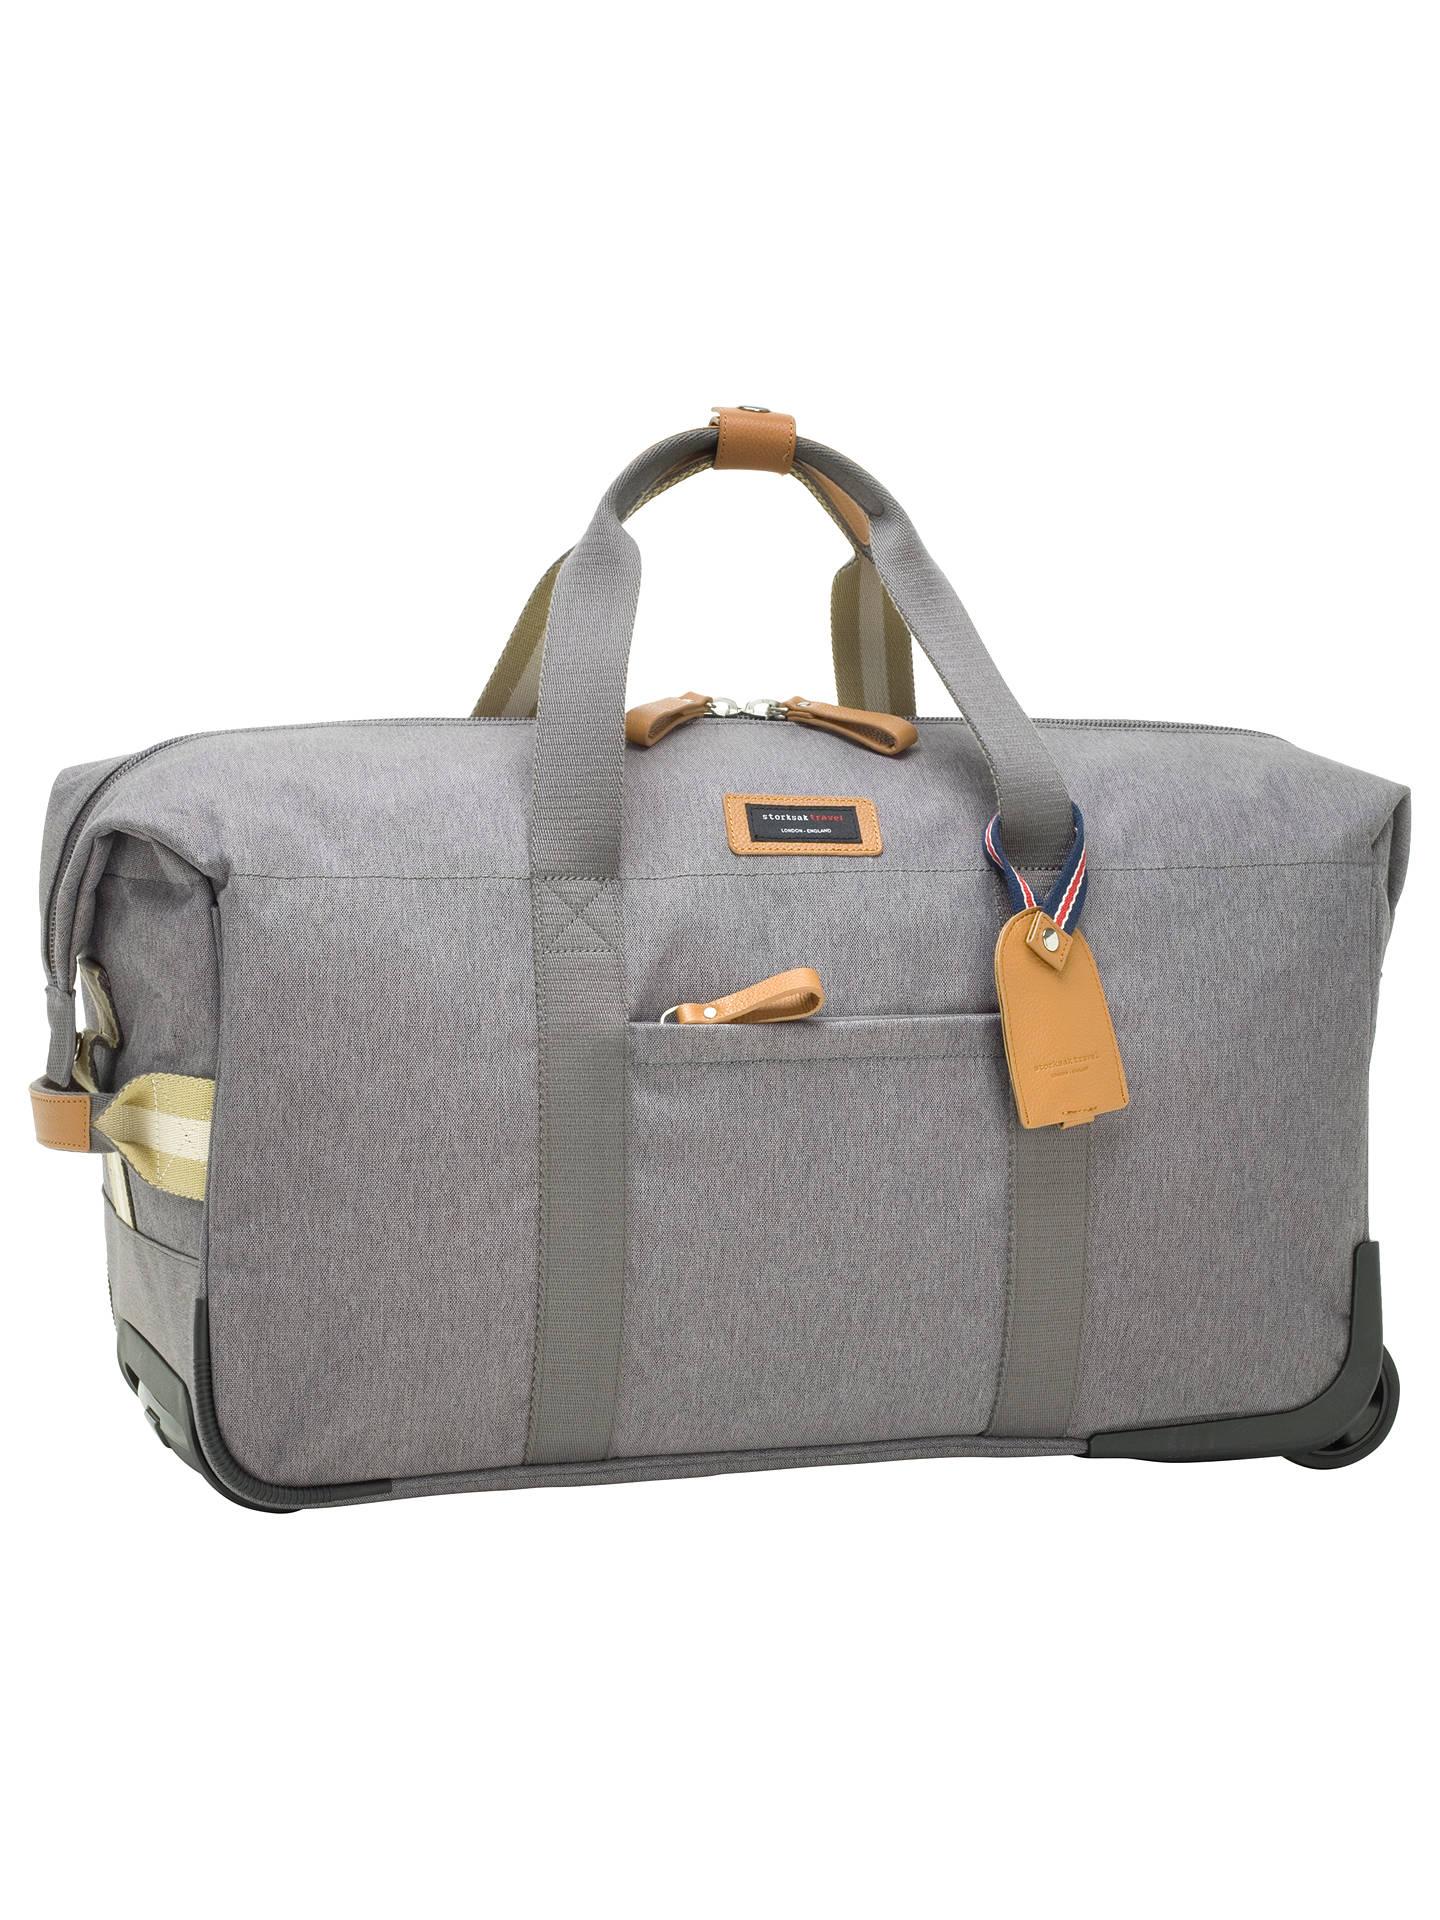 e2c82e8cfe Storksak Travel Cabin Bag at John Lewis   Partners